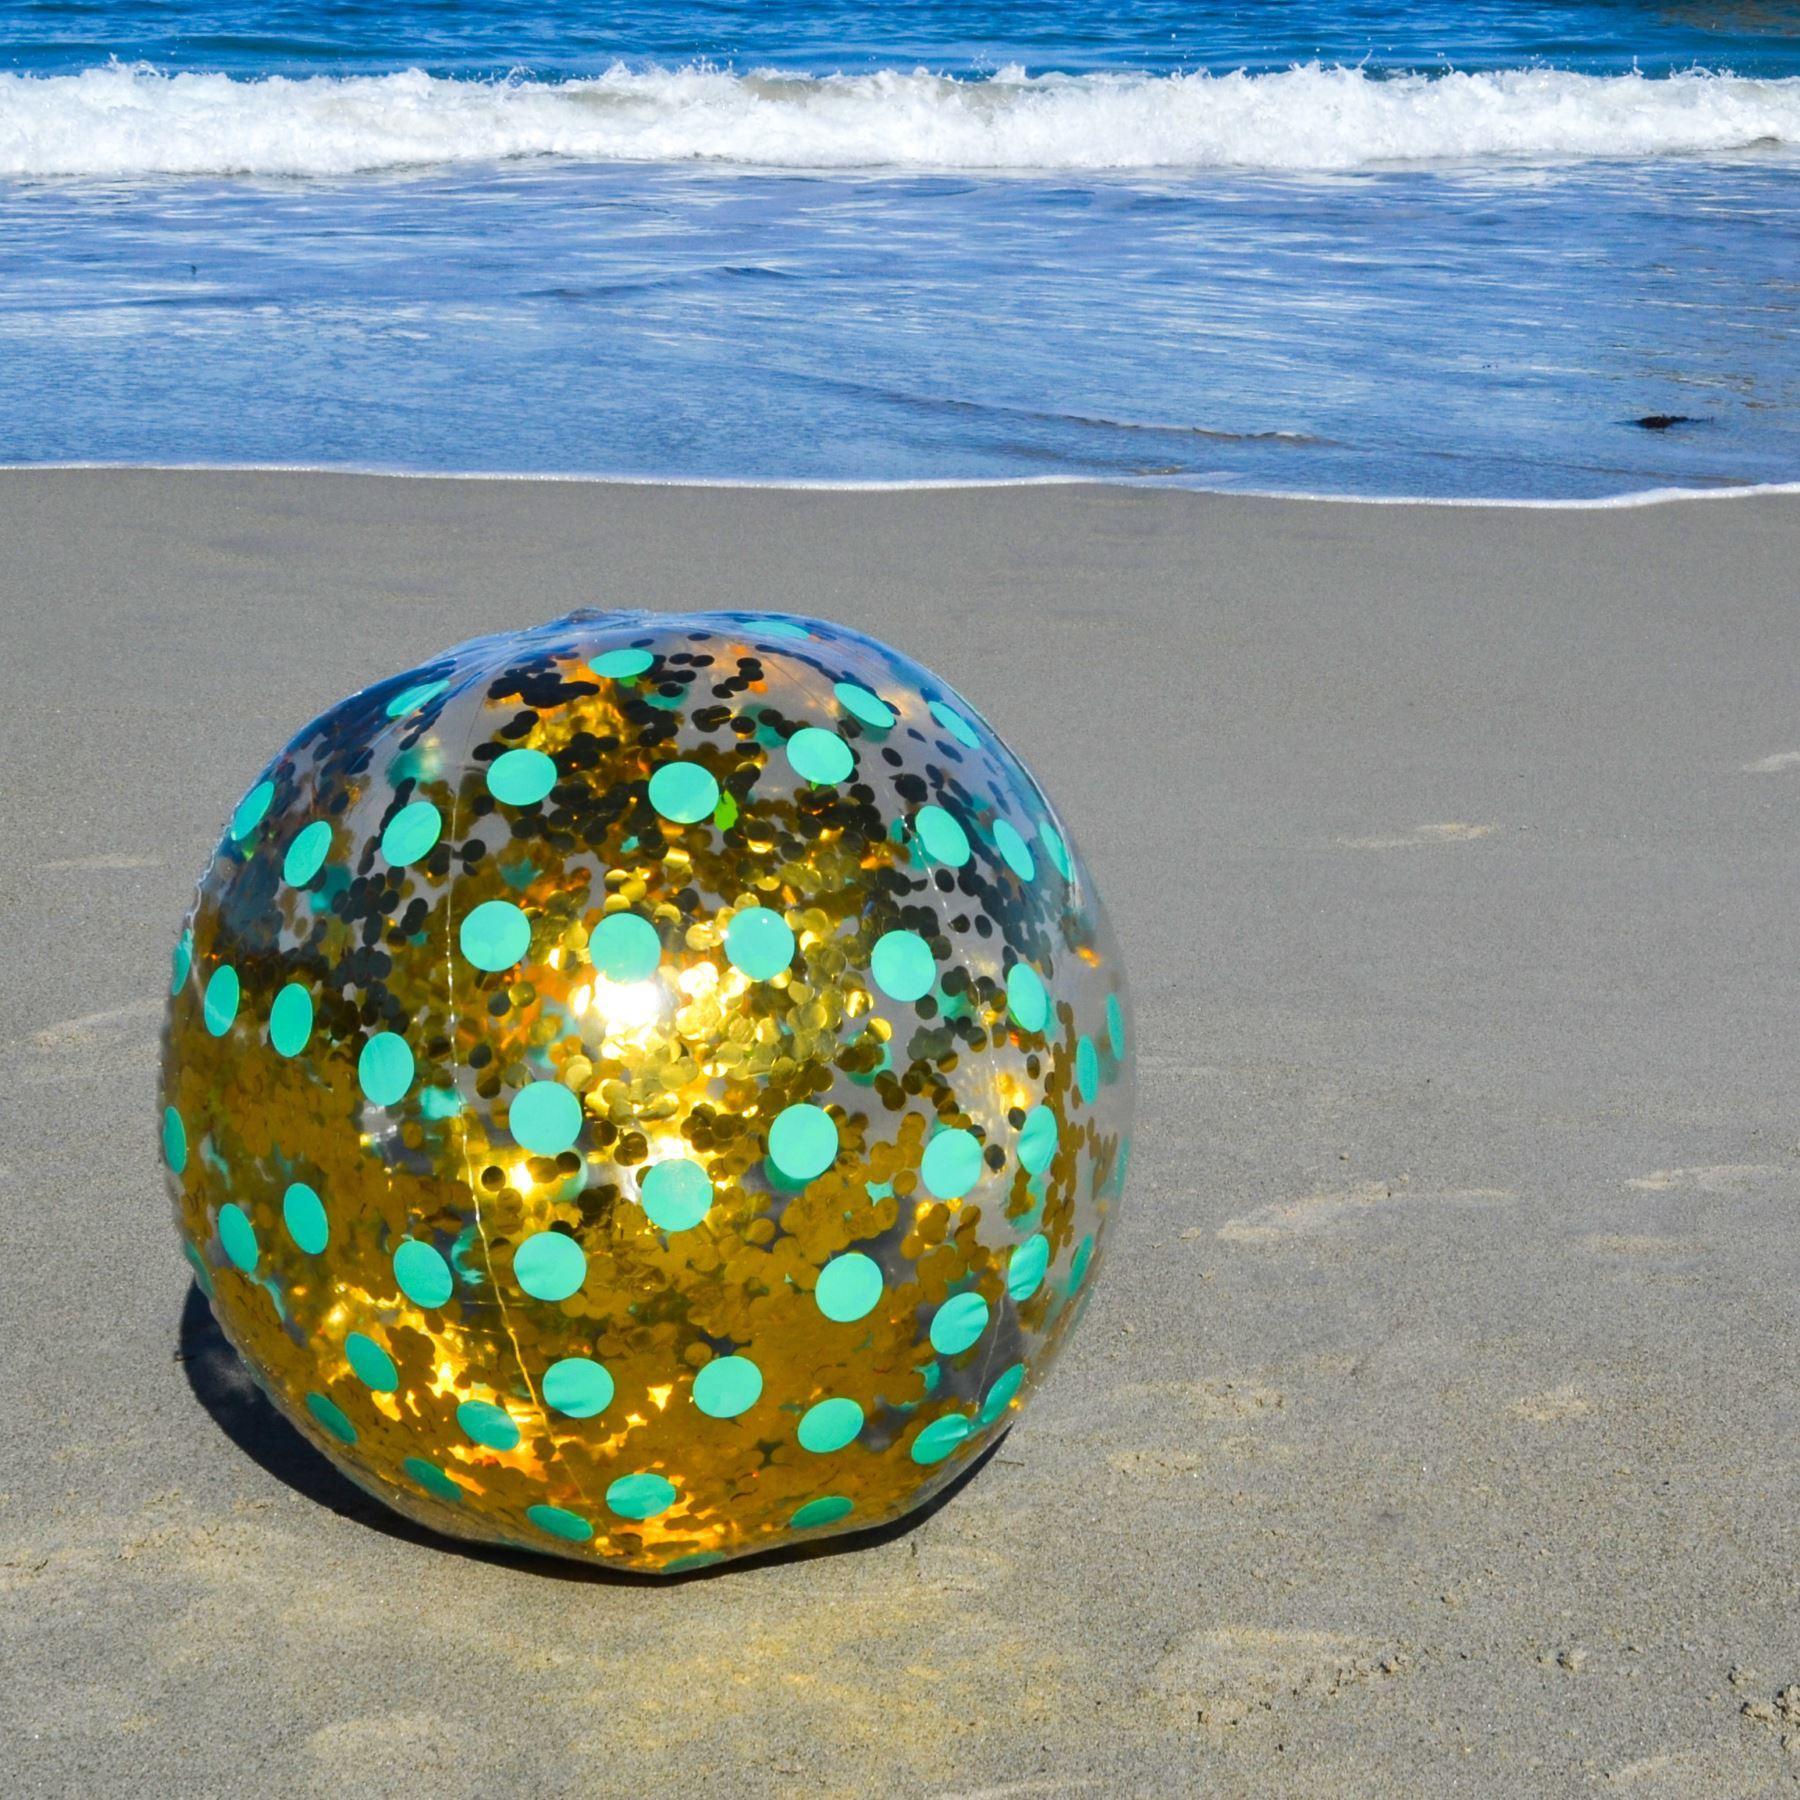 Hinchable Gigante Purpurina Pelota de Playa Grande Jumbo  9ea82630eb86